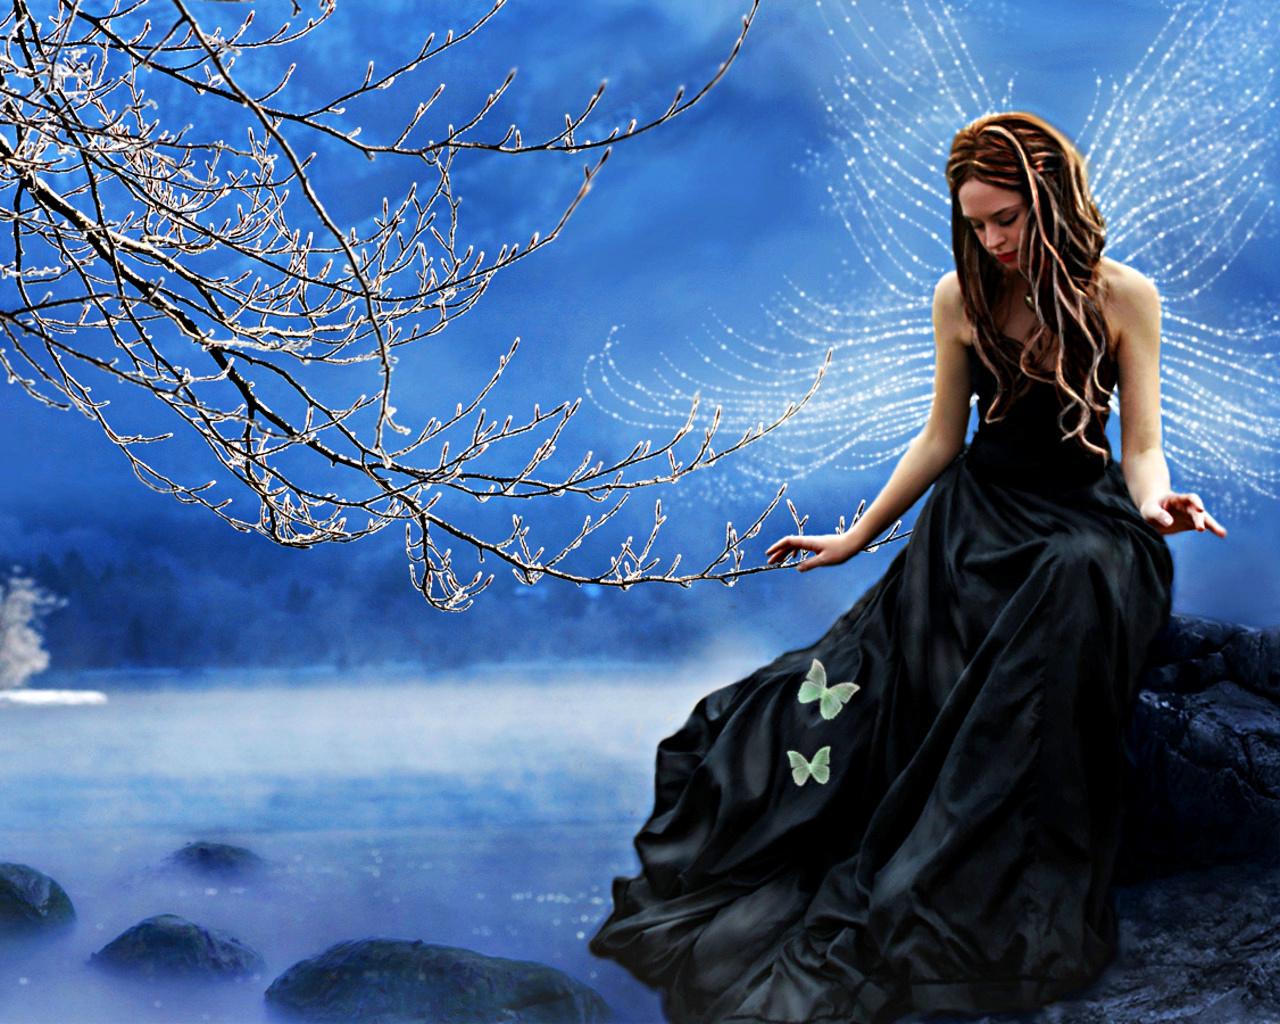 water fairy wallpaper beautiful - photo #3